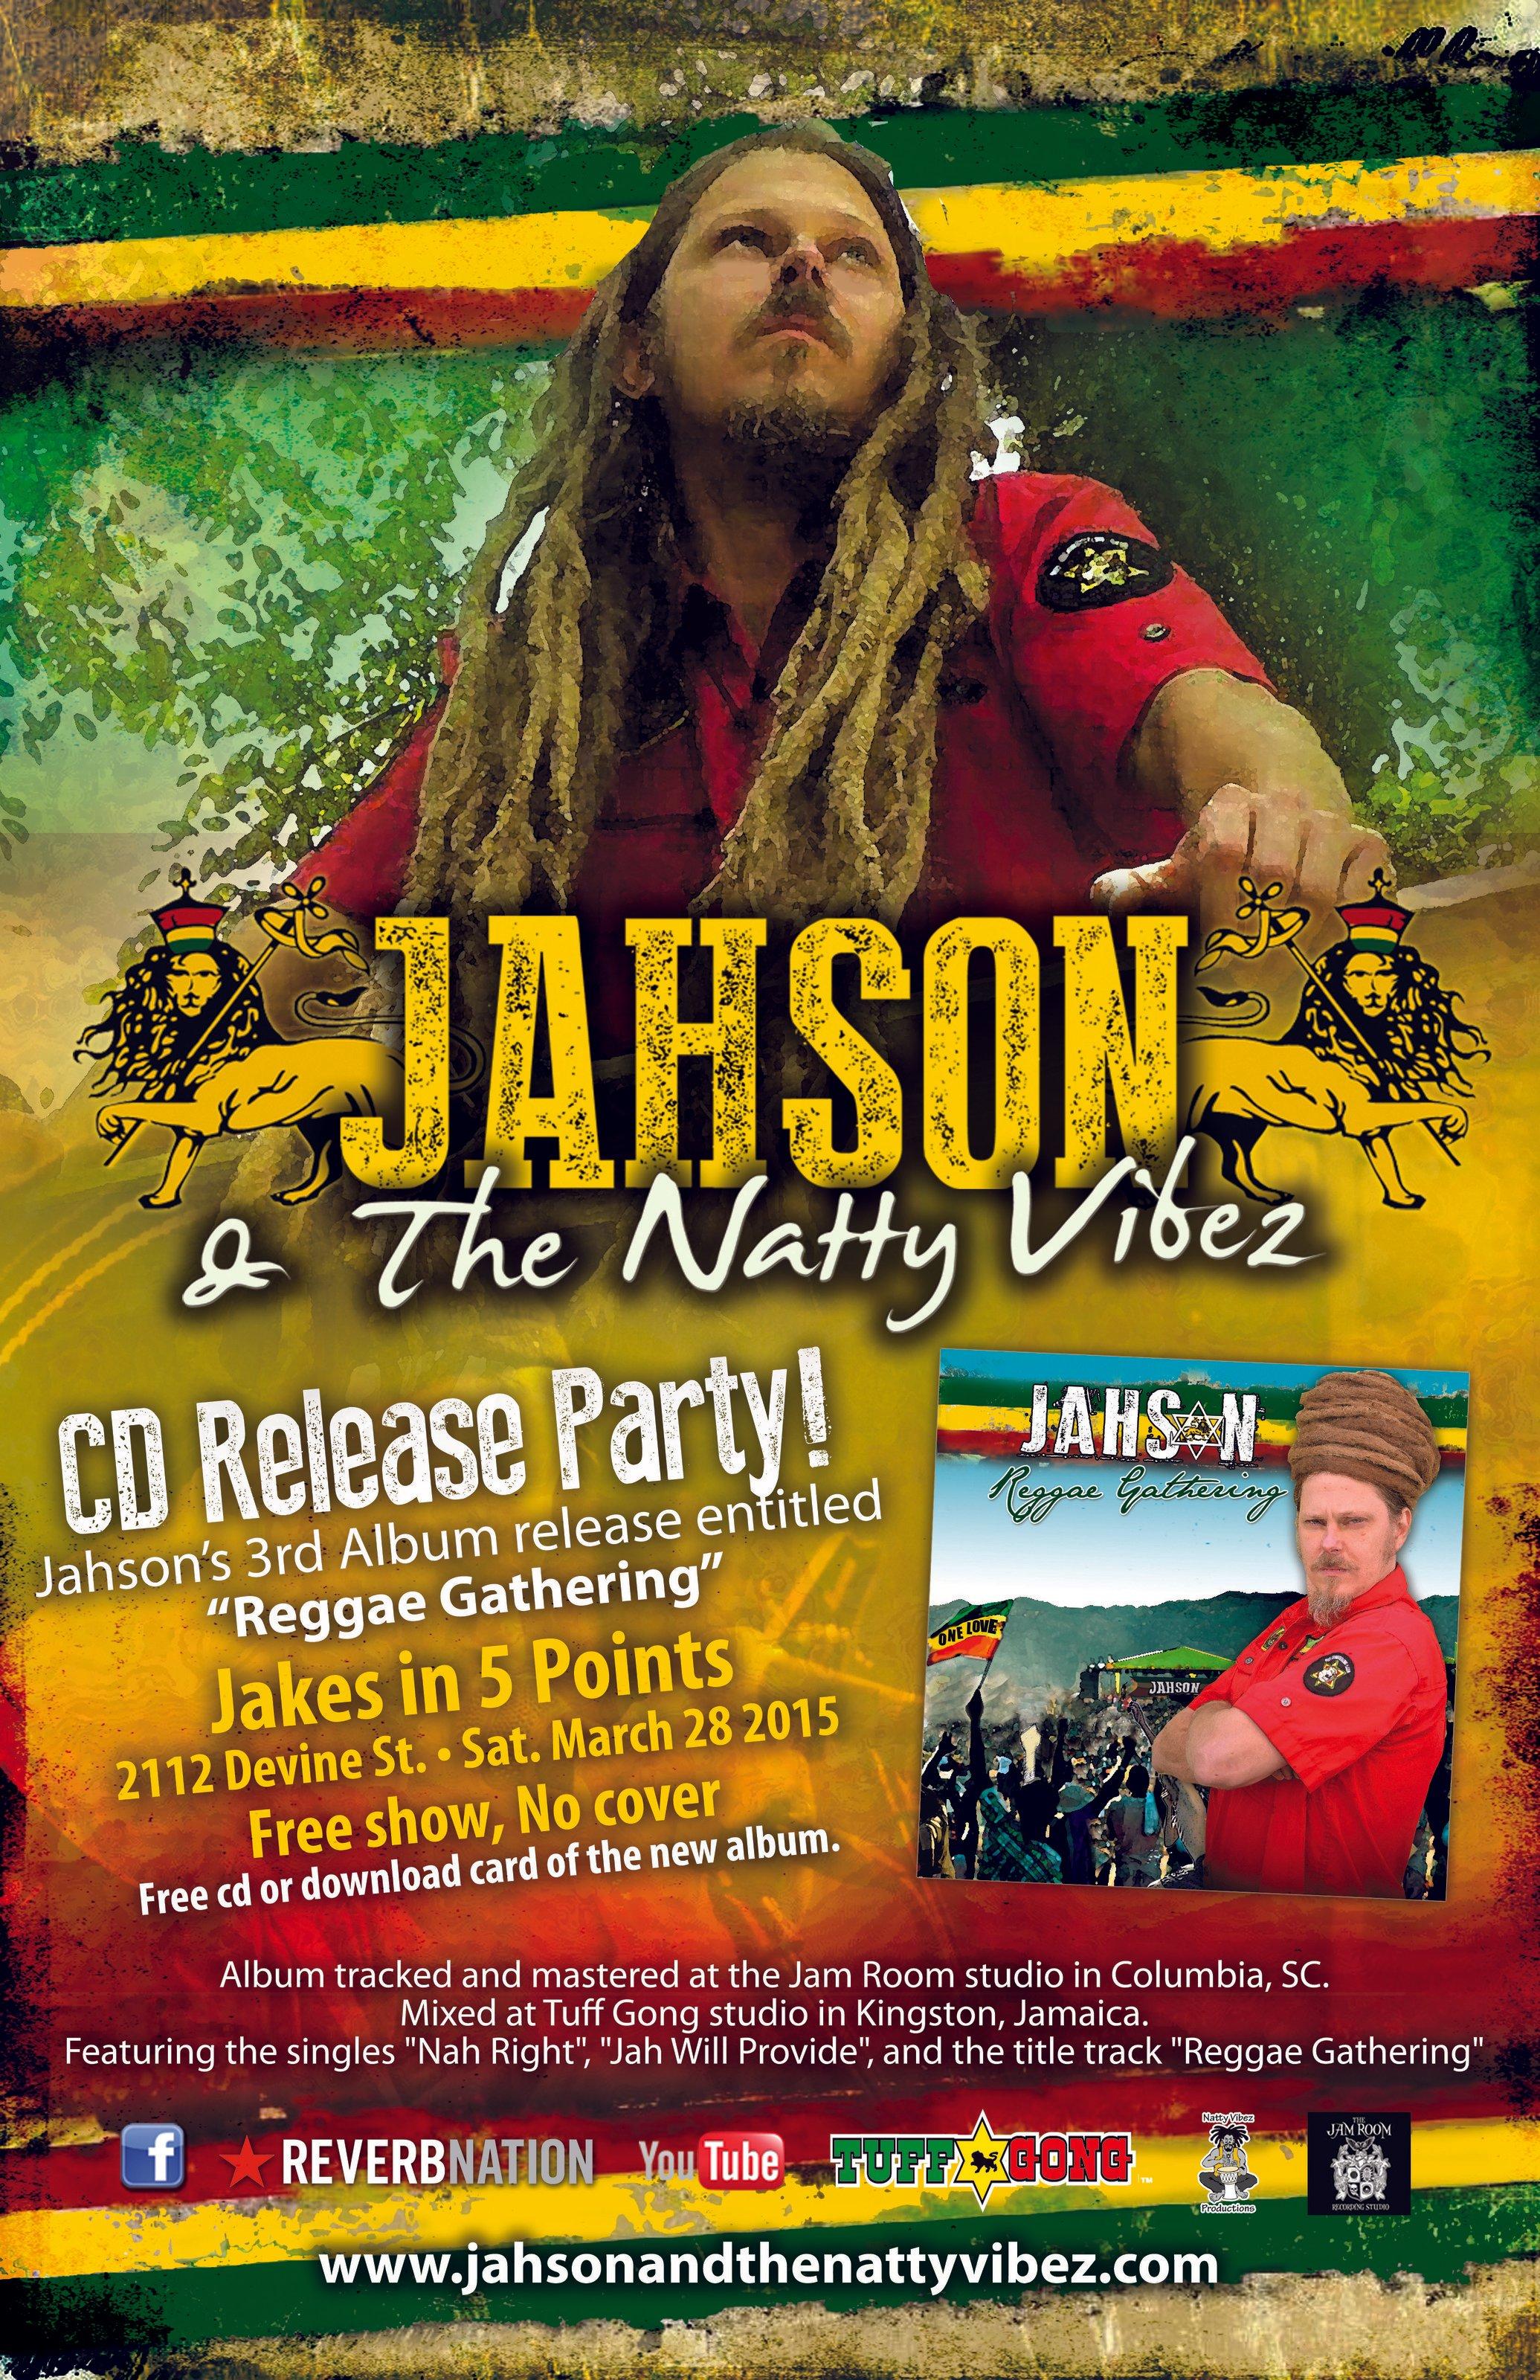 Jahson & The Natty Vibez   ReverbNation